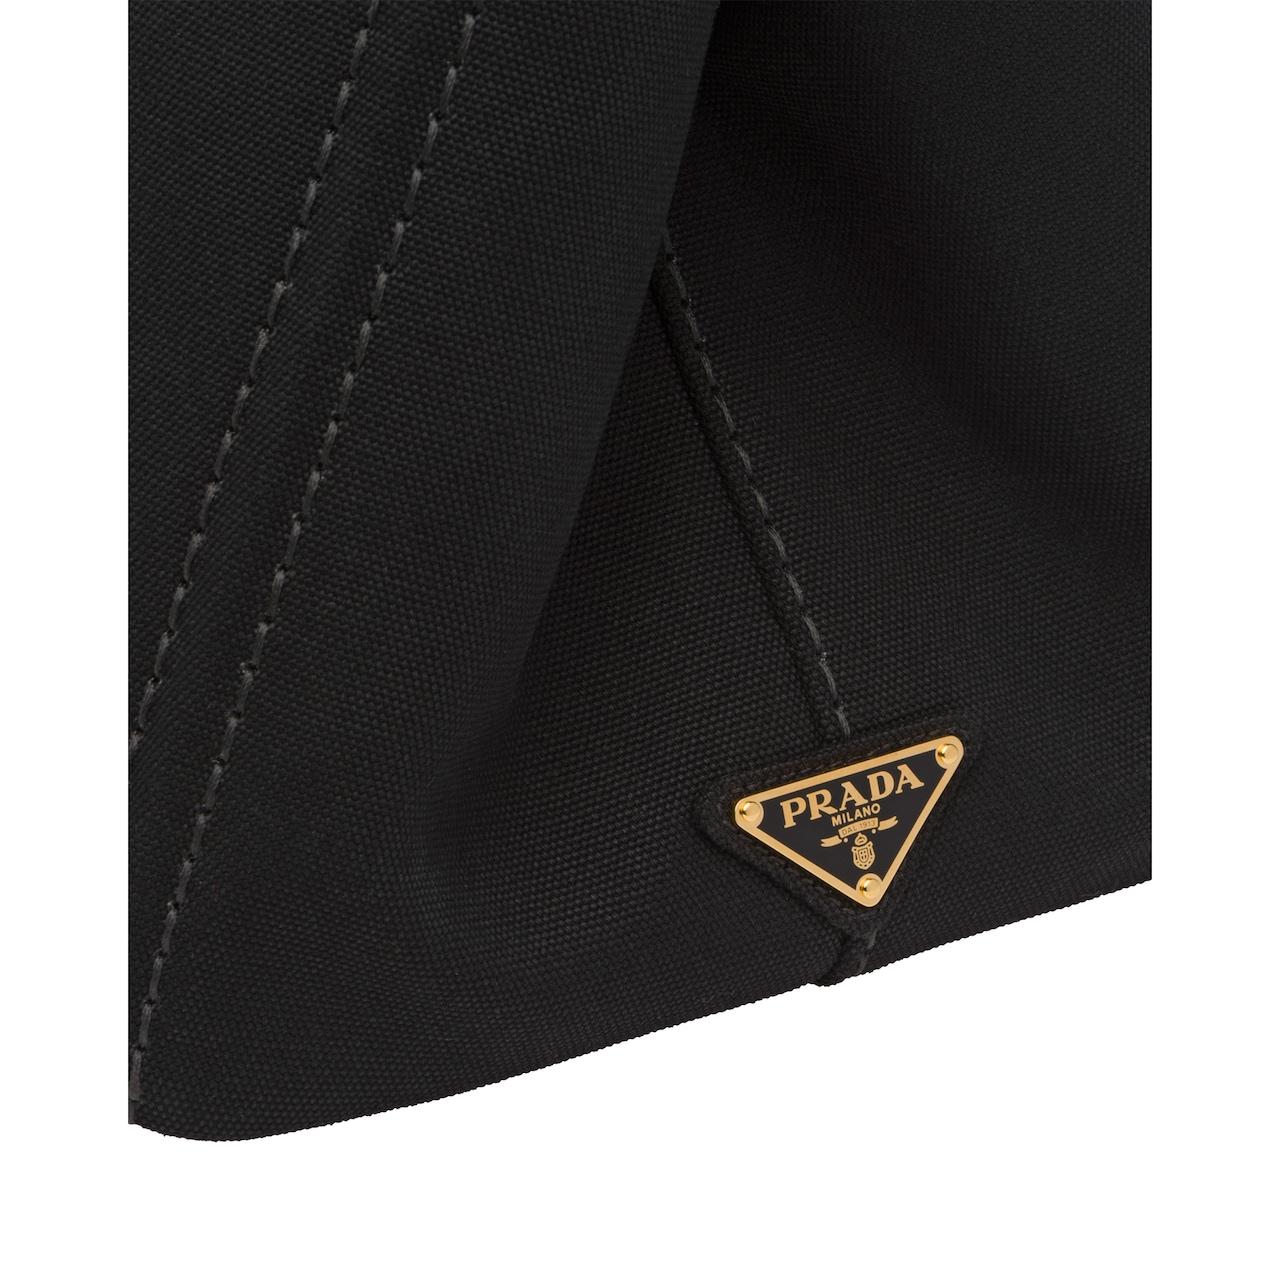 Hemp fabric handbag